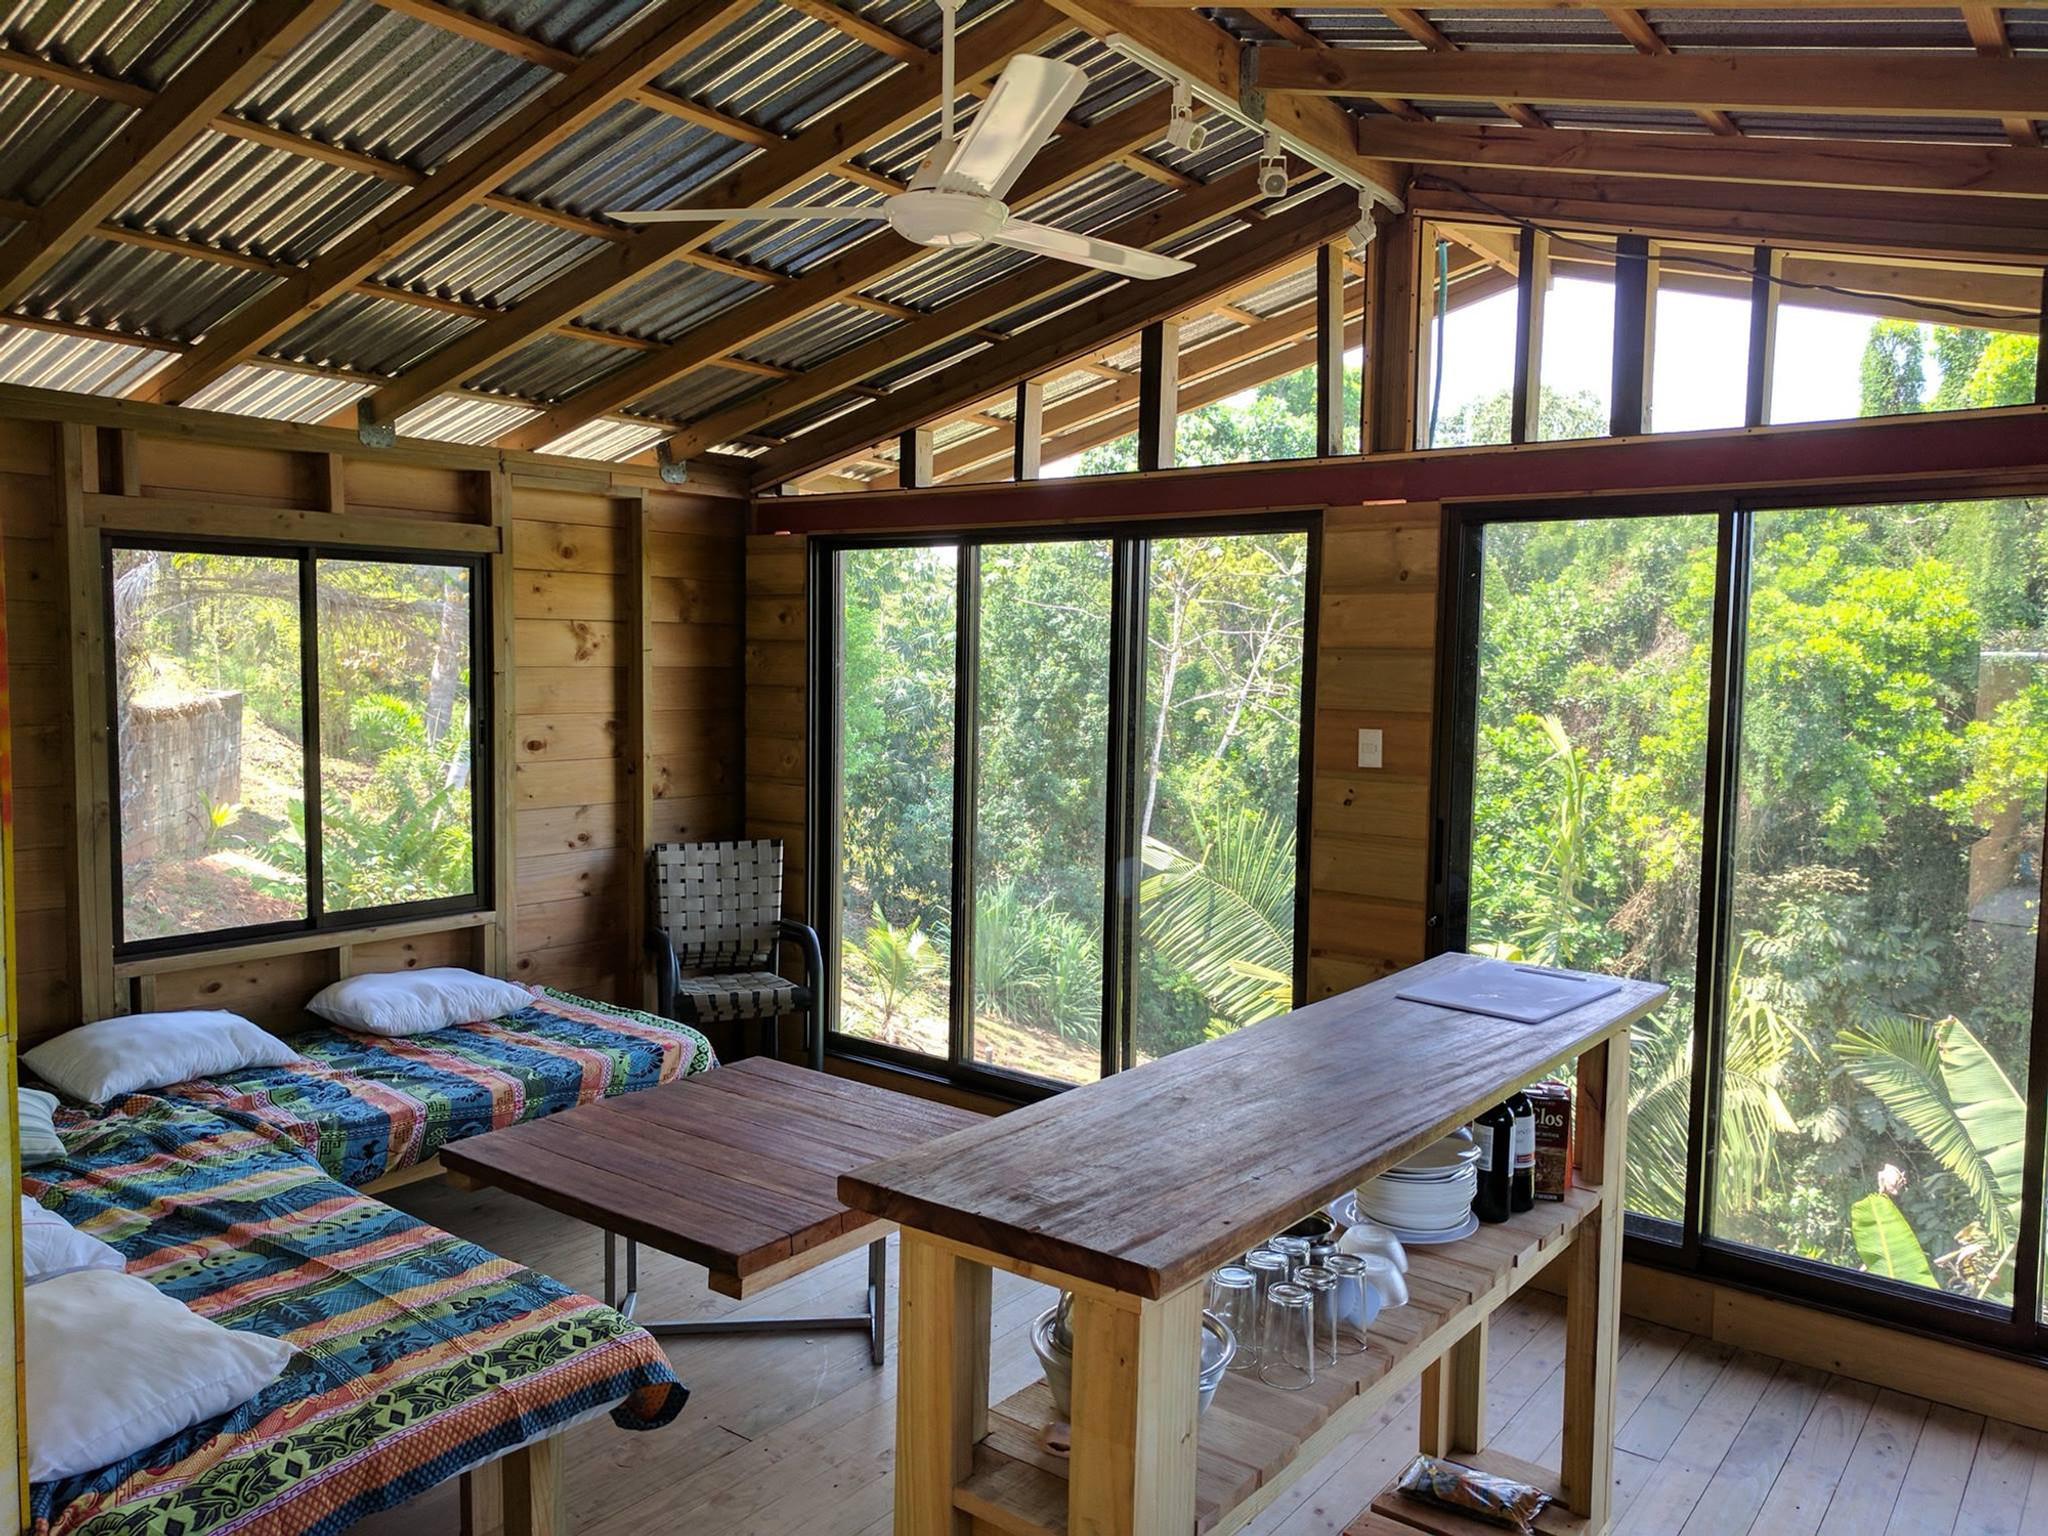 Casa Bamboo AirBnB